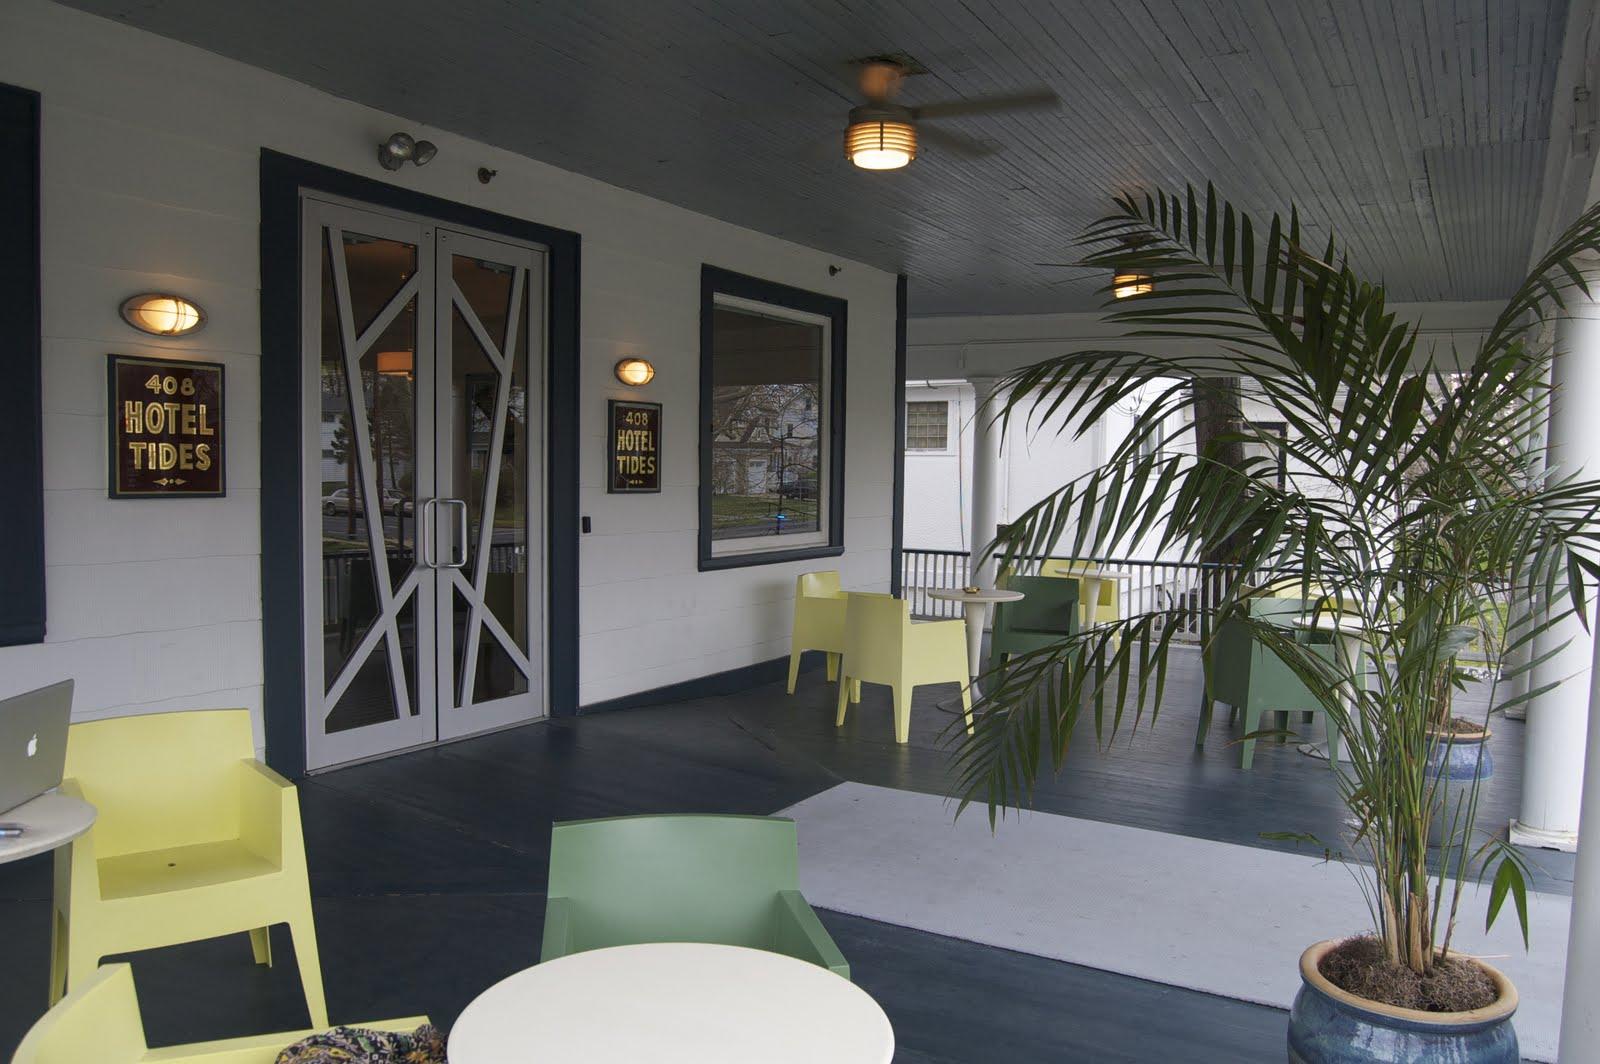 Stellabella jersey shore tattoo shop boutique hotel for Best boutique hotels jersey shore